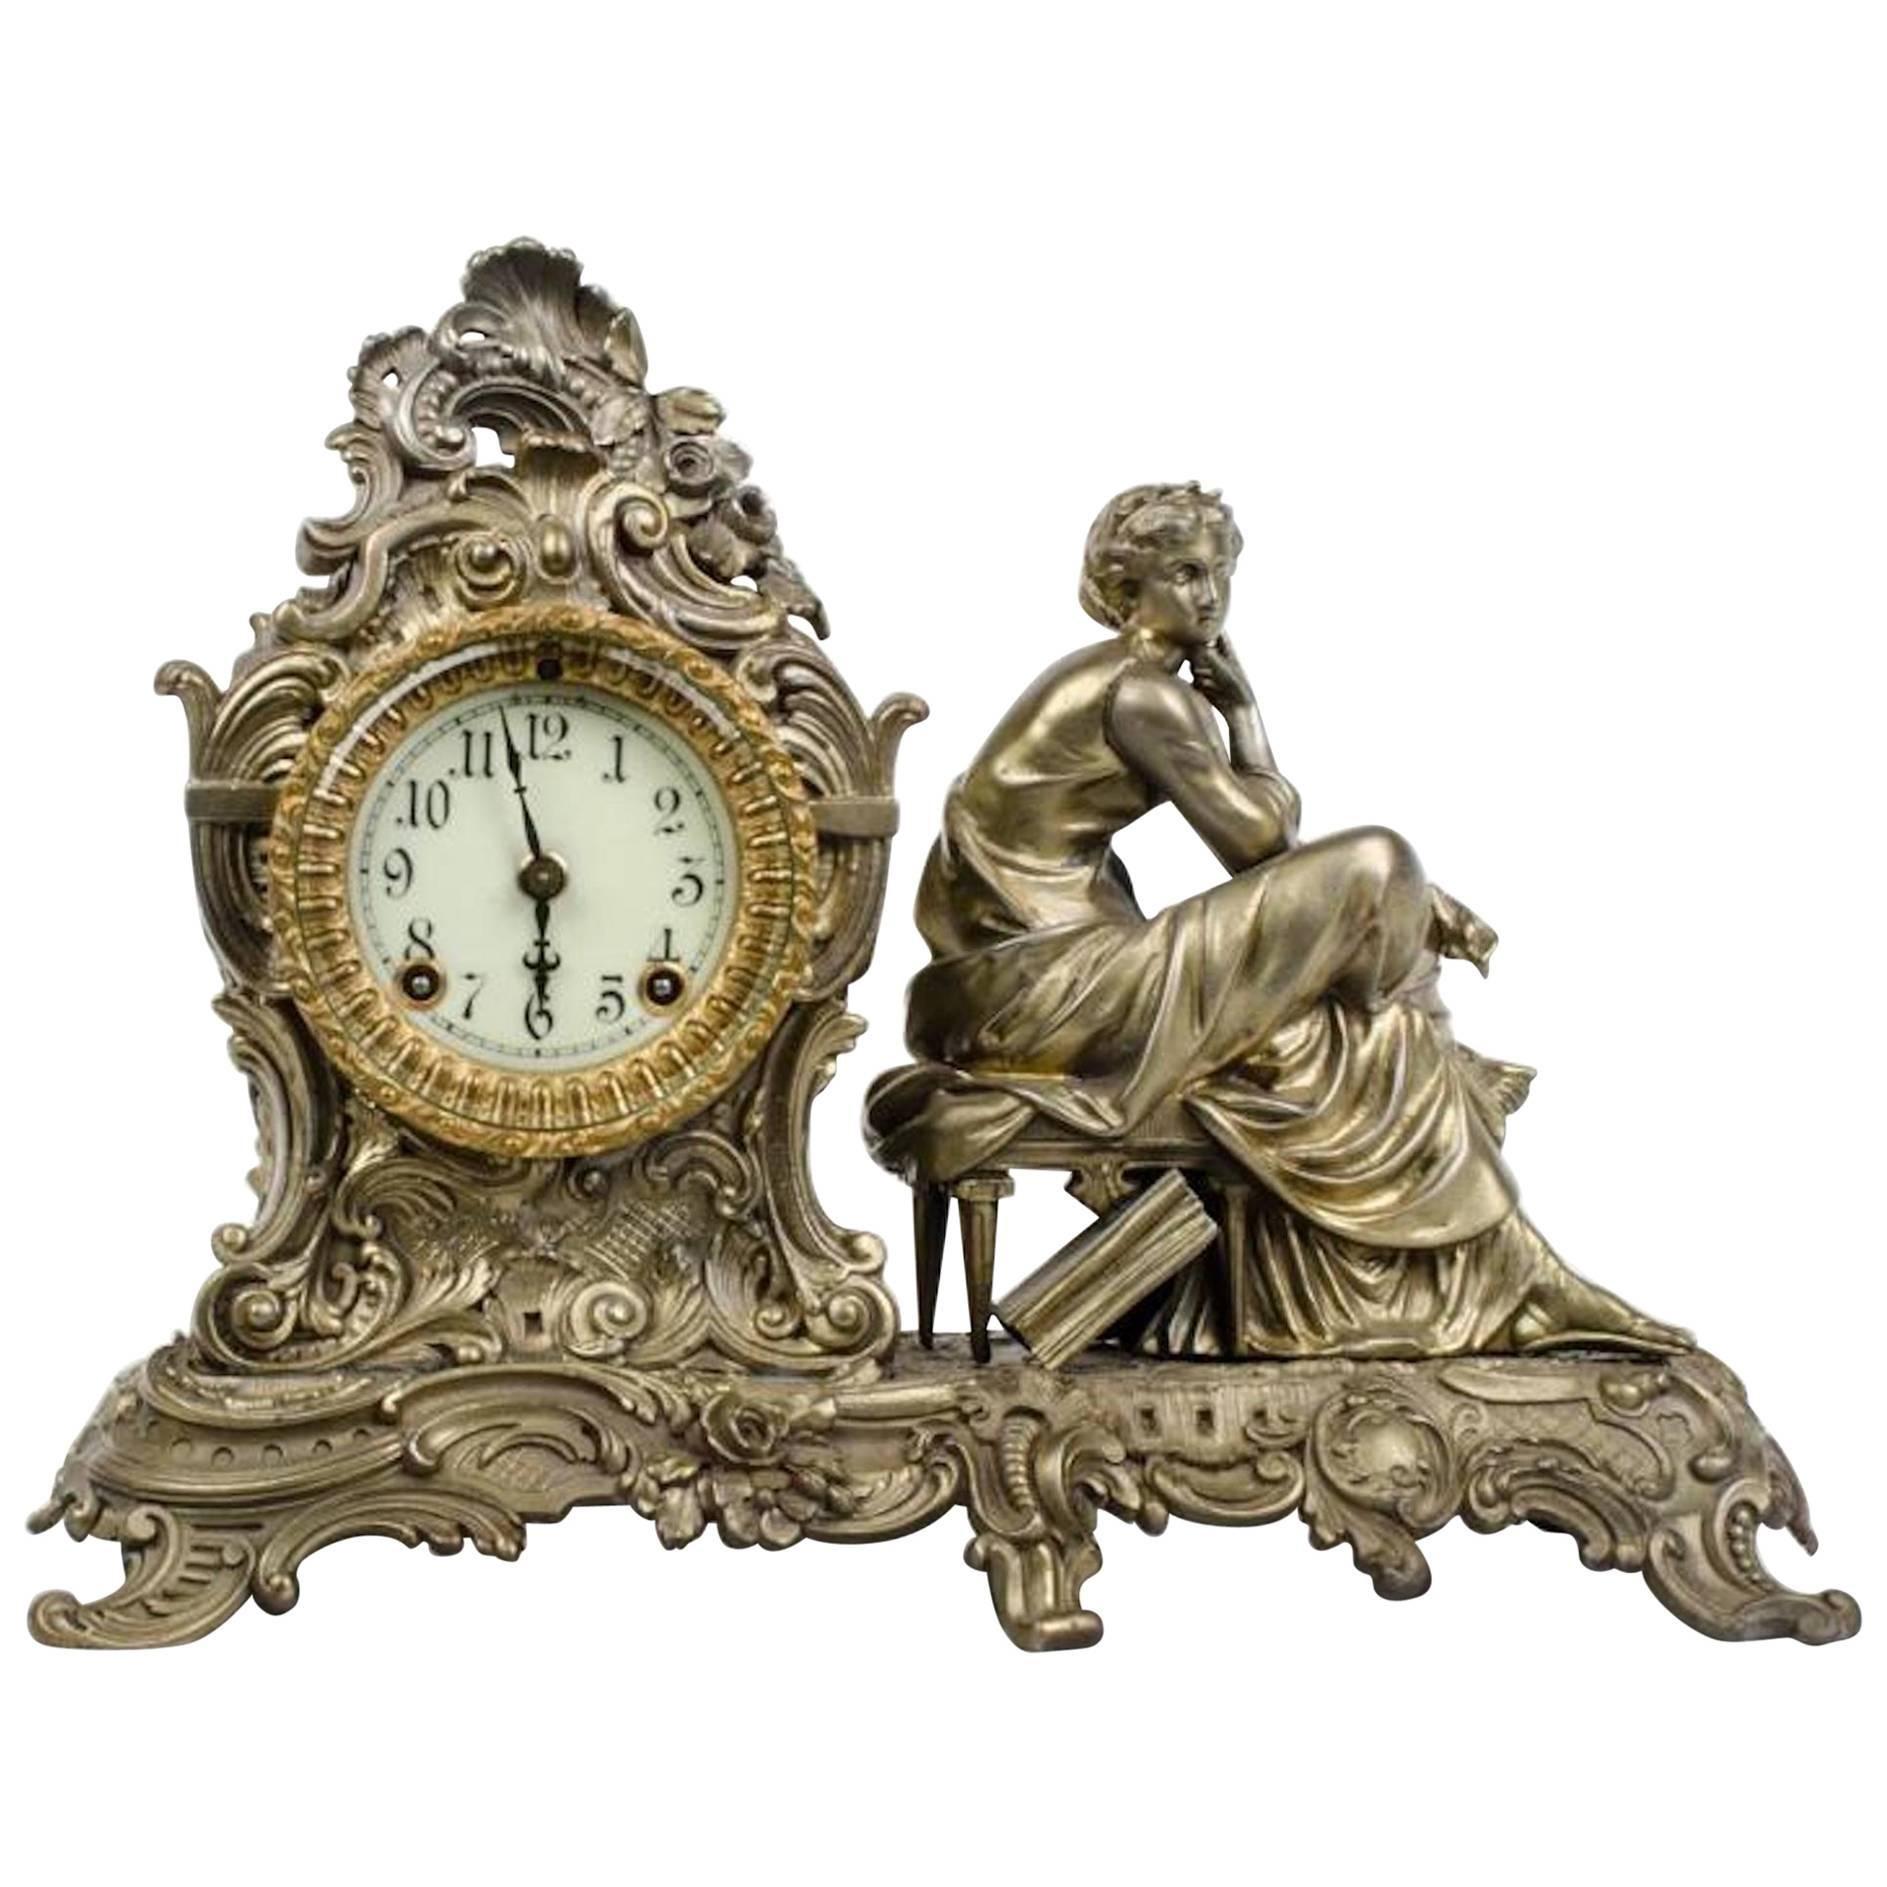 19th Century Mantel Clock Bronze Gilt Statue by Ansonia Clock Company